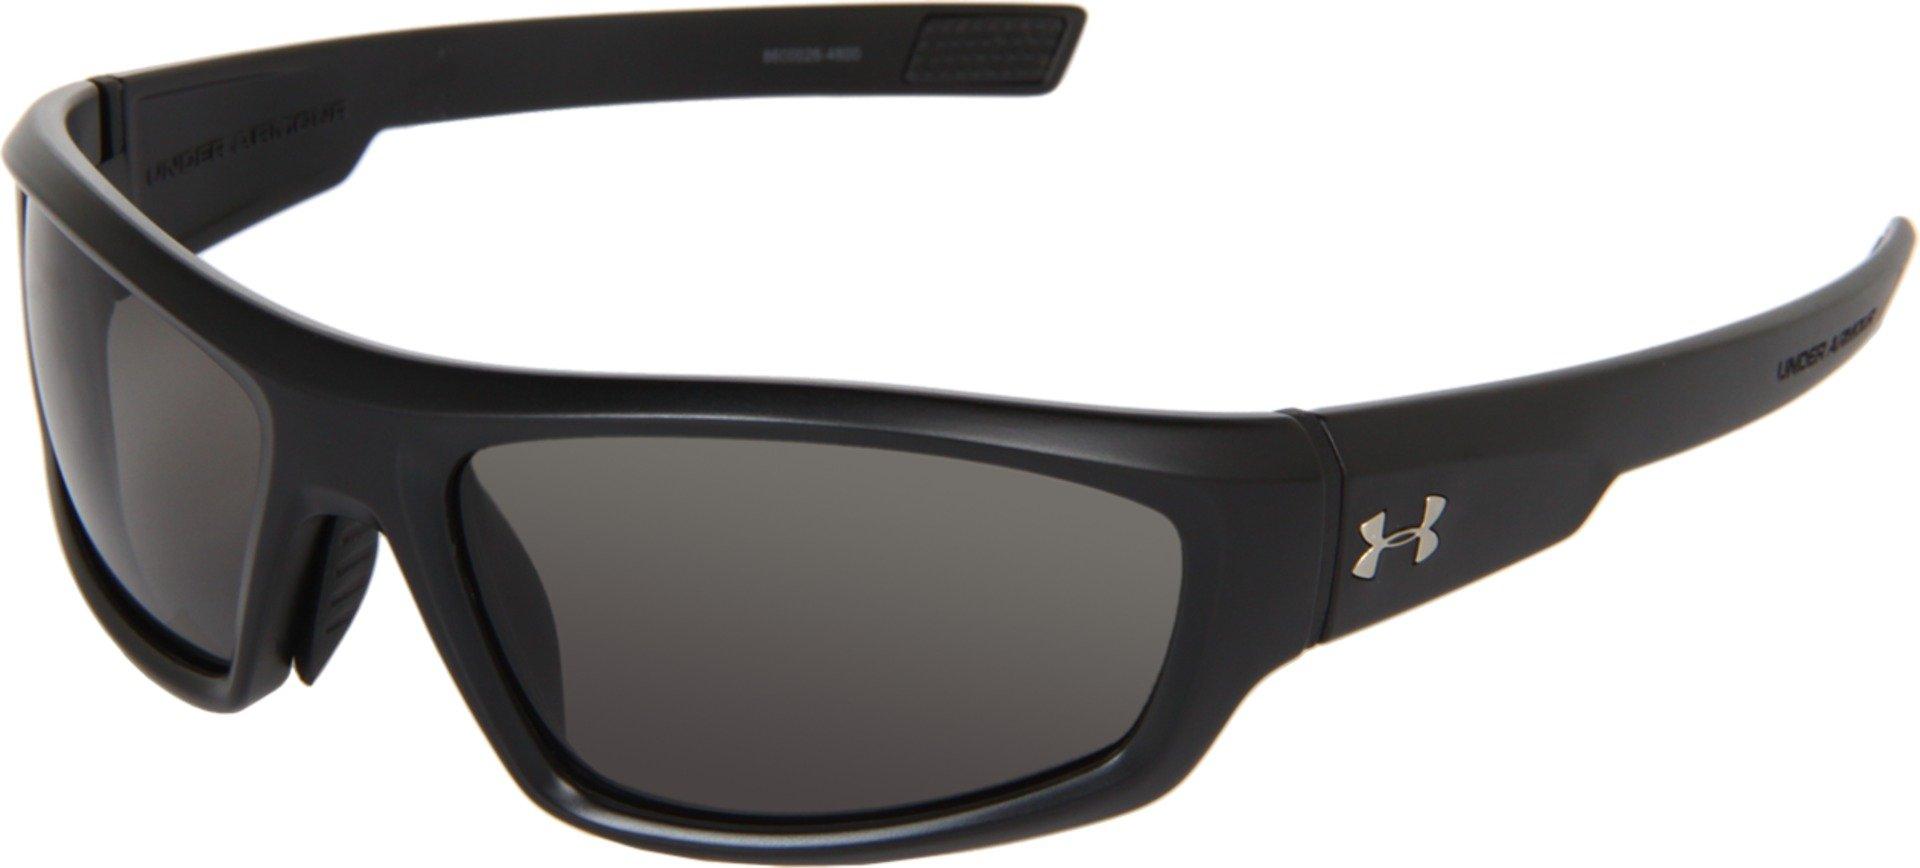 Under Armour Power Sunglasses